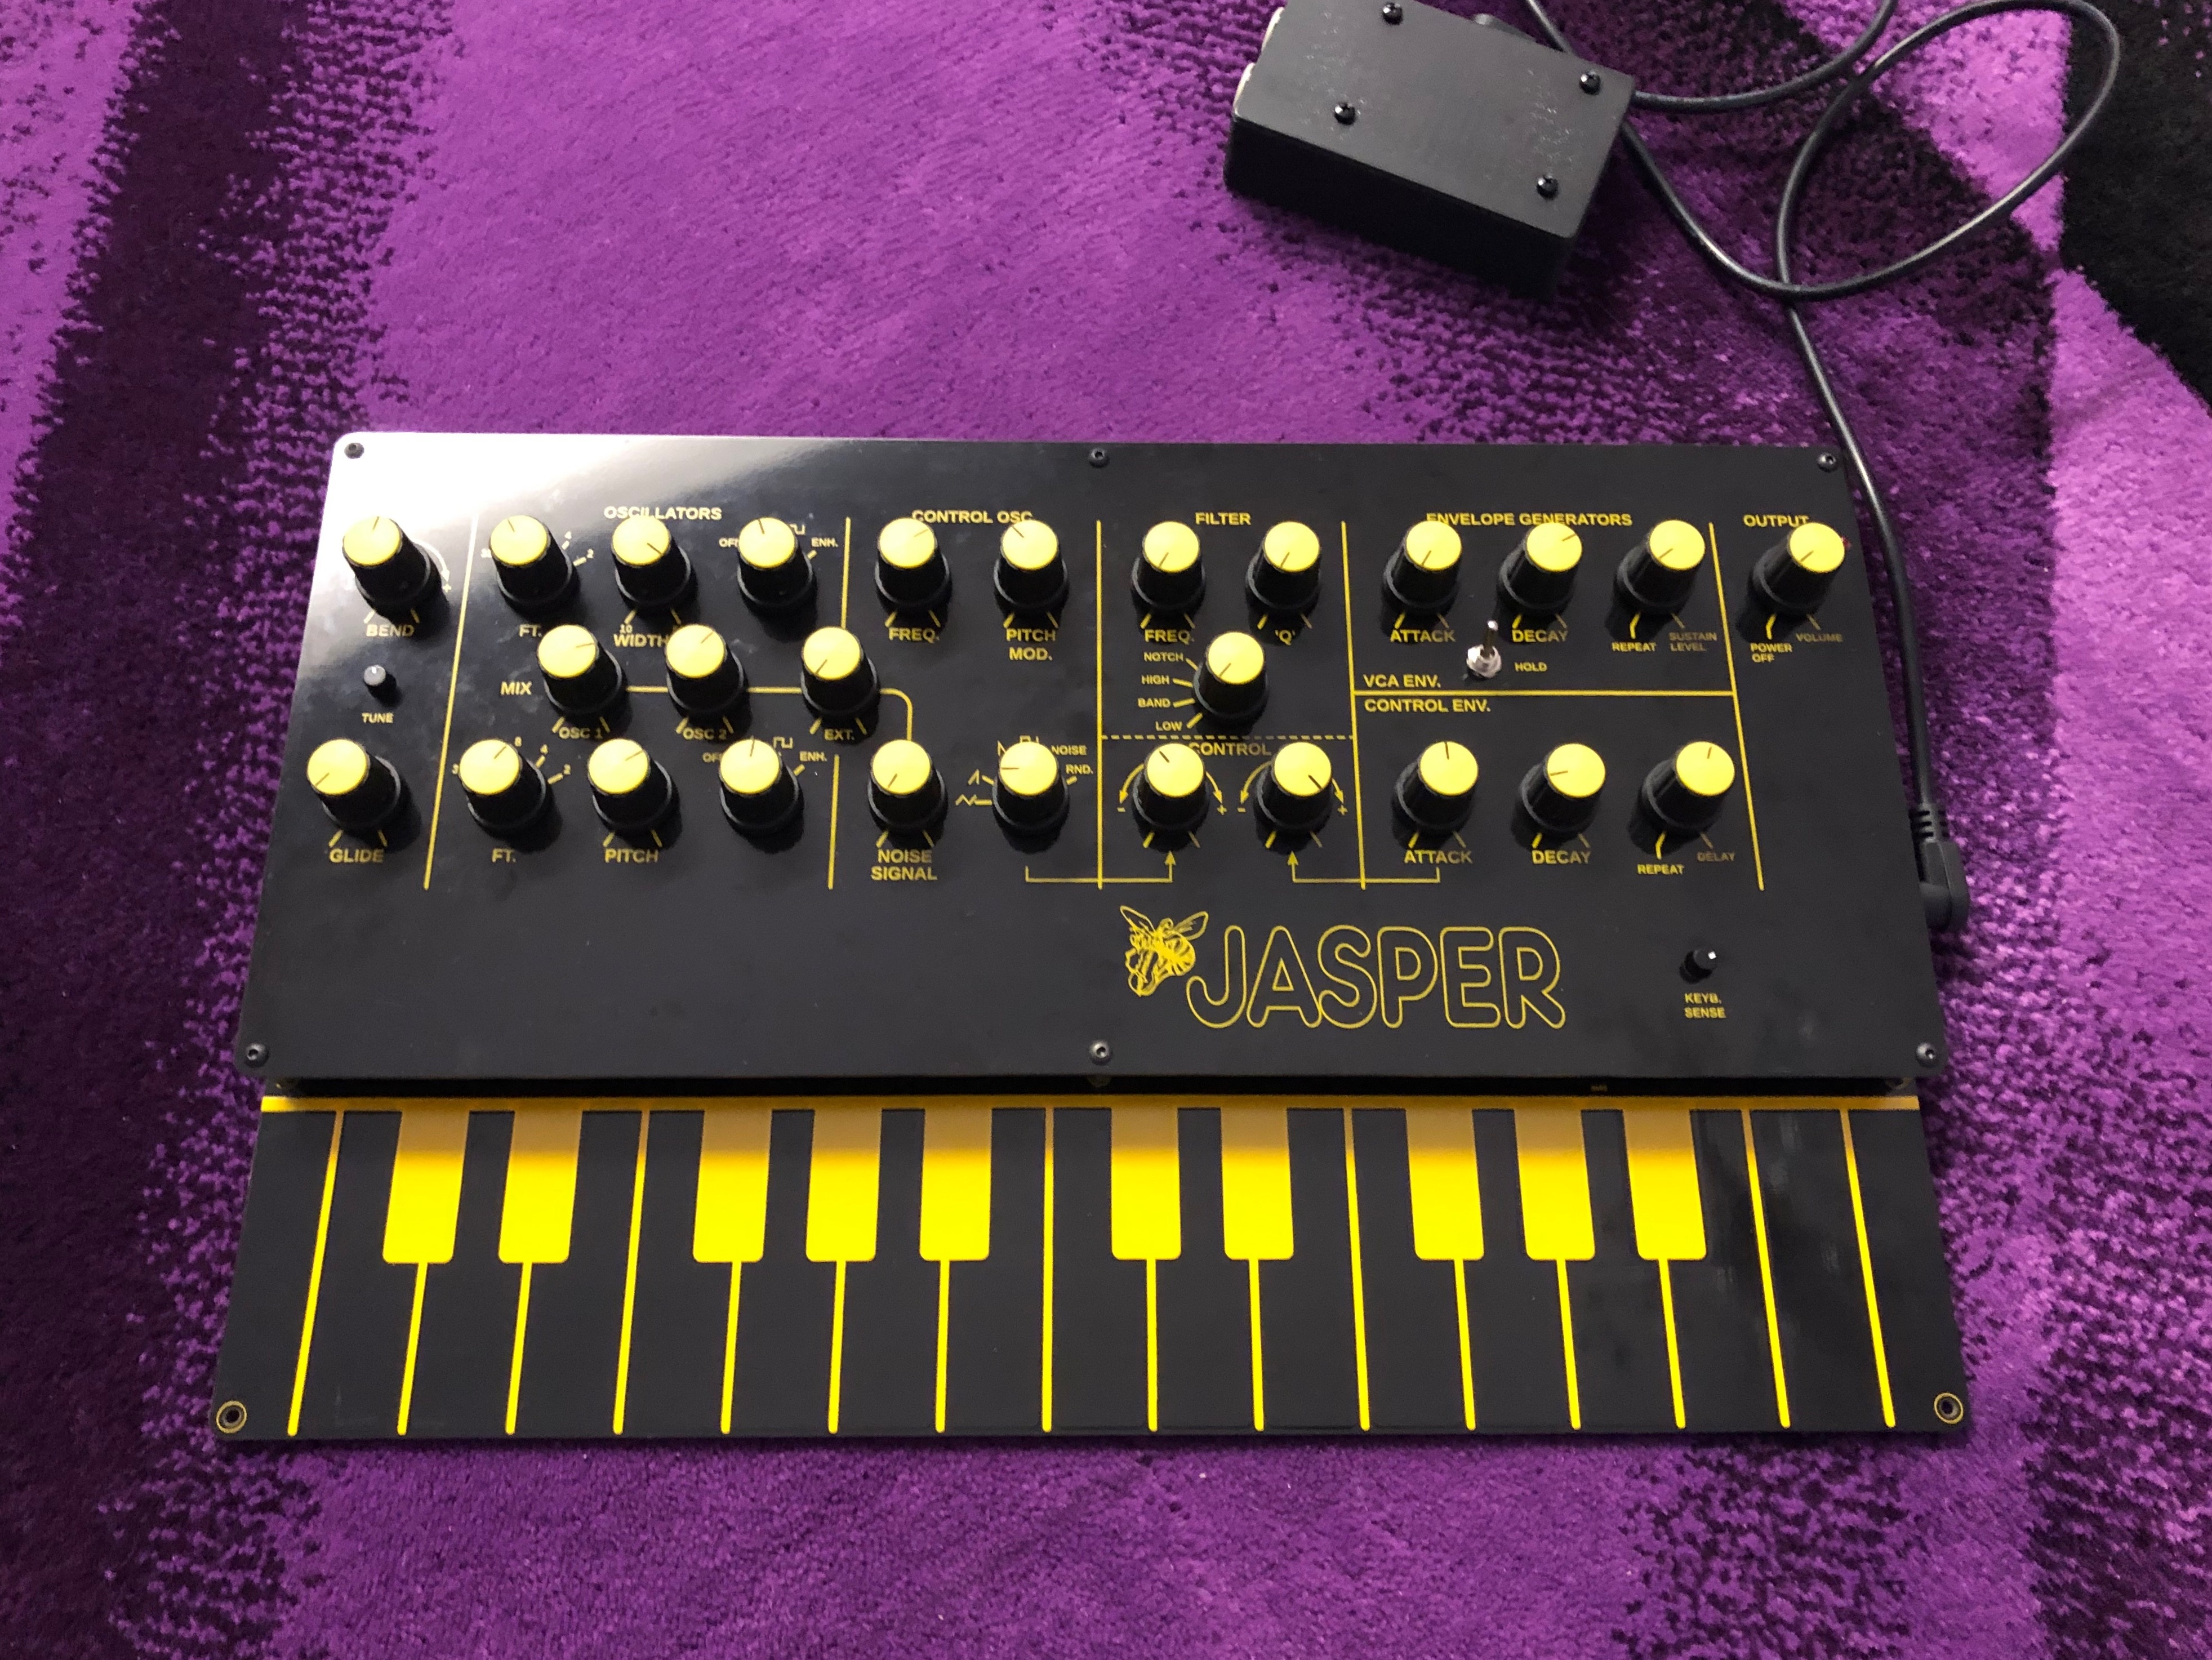 Jasper Wasp Clone - DIY Synth other - We love DIY Synthesizer